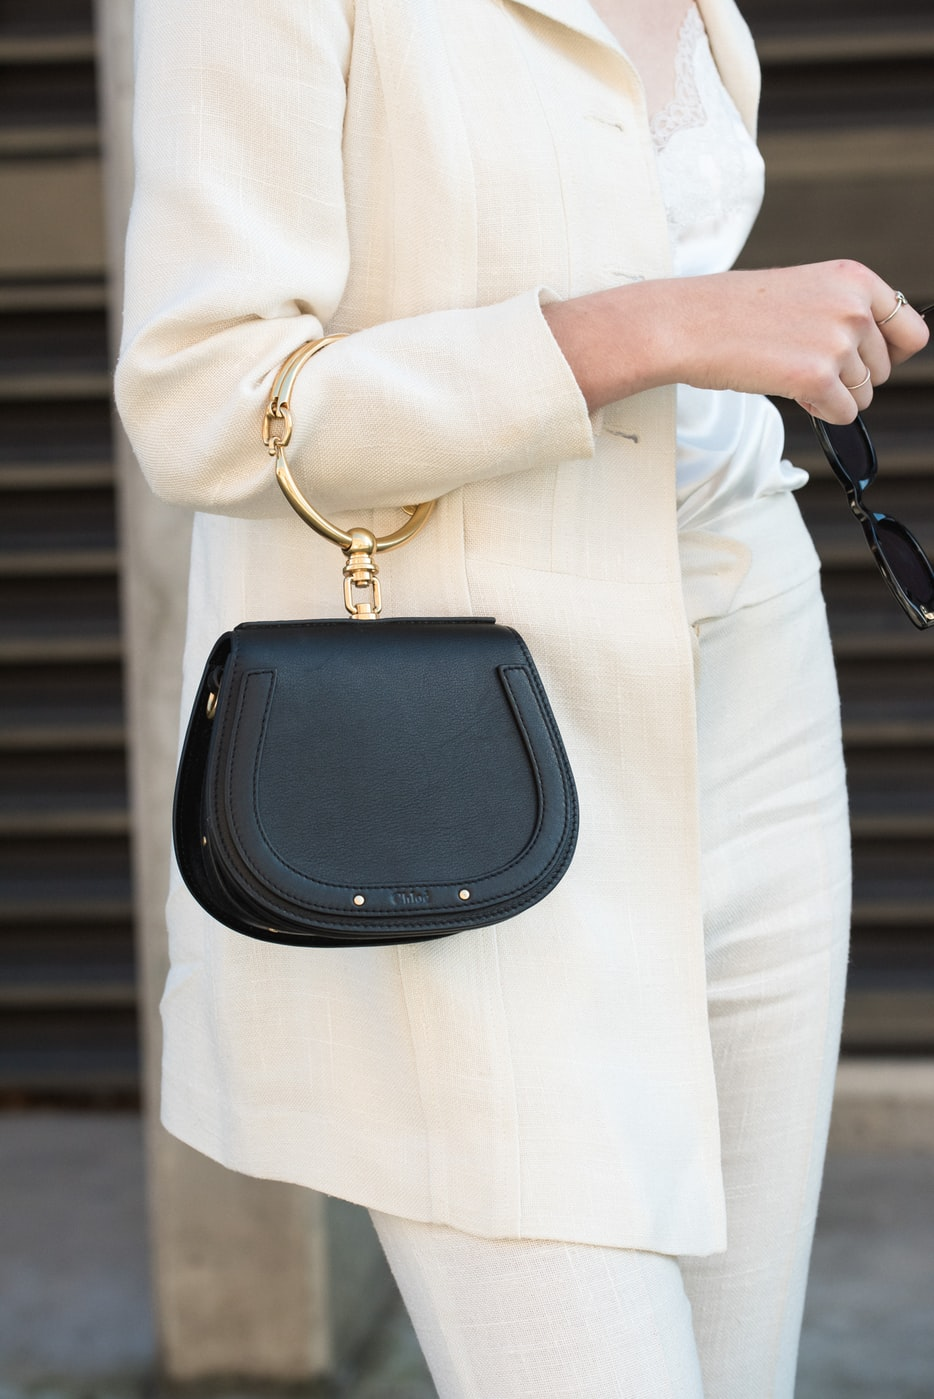 milano-fashion-week-2020-ricerche-utenti